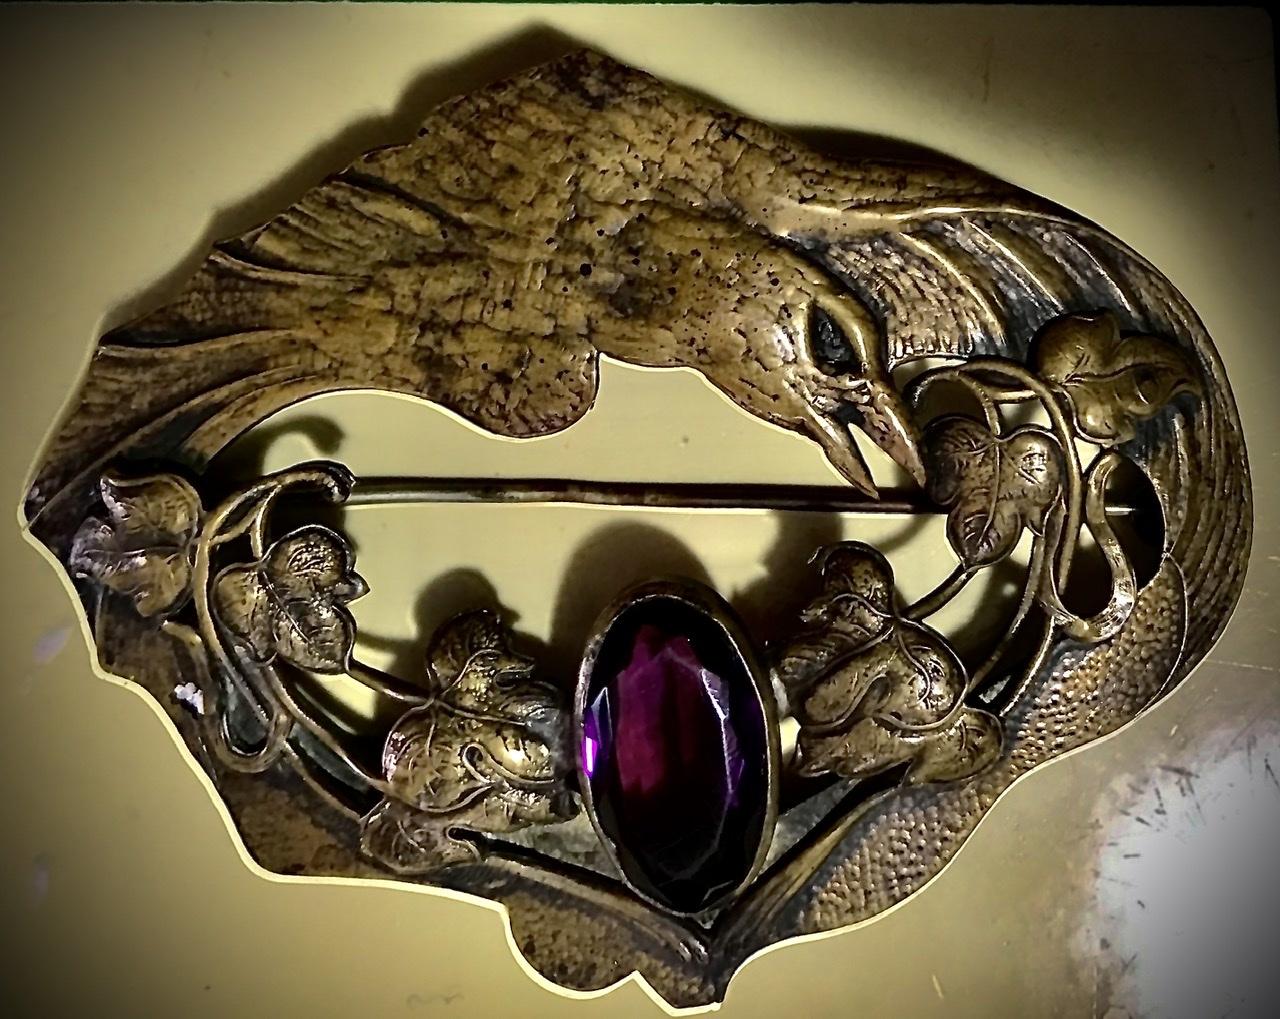 Incredible GEORGE STEERE Edwardian Era Sash Pin